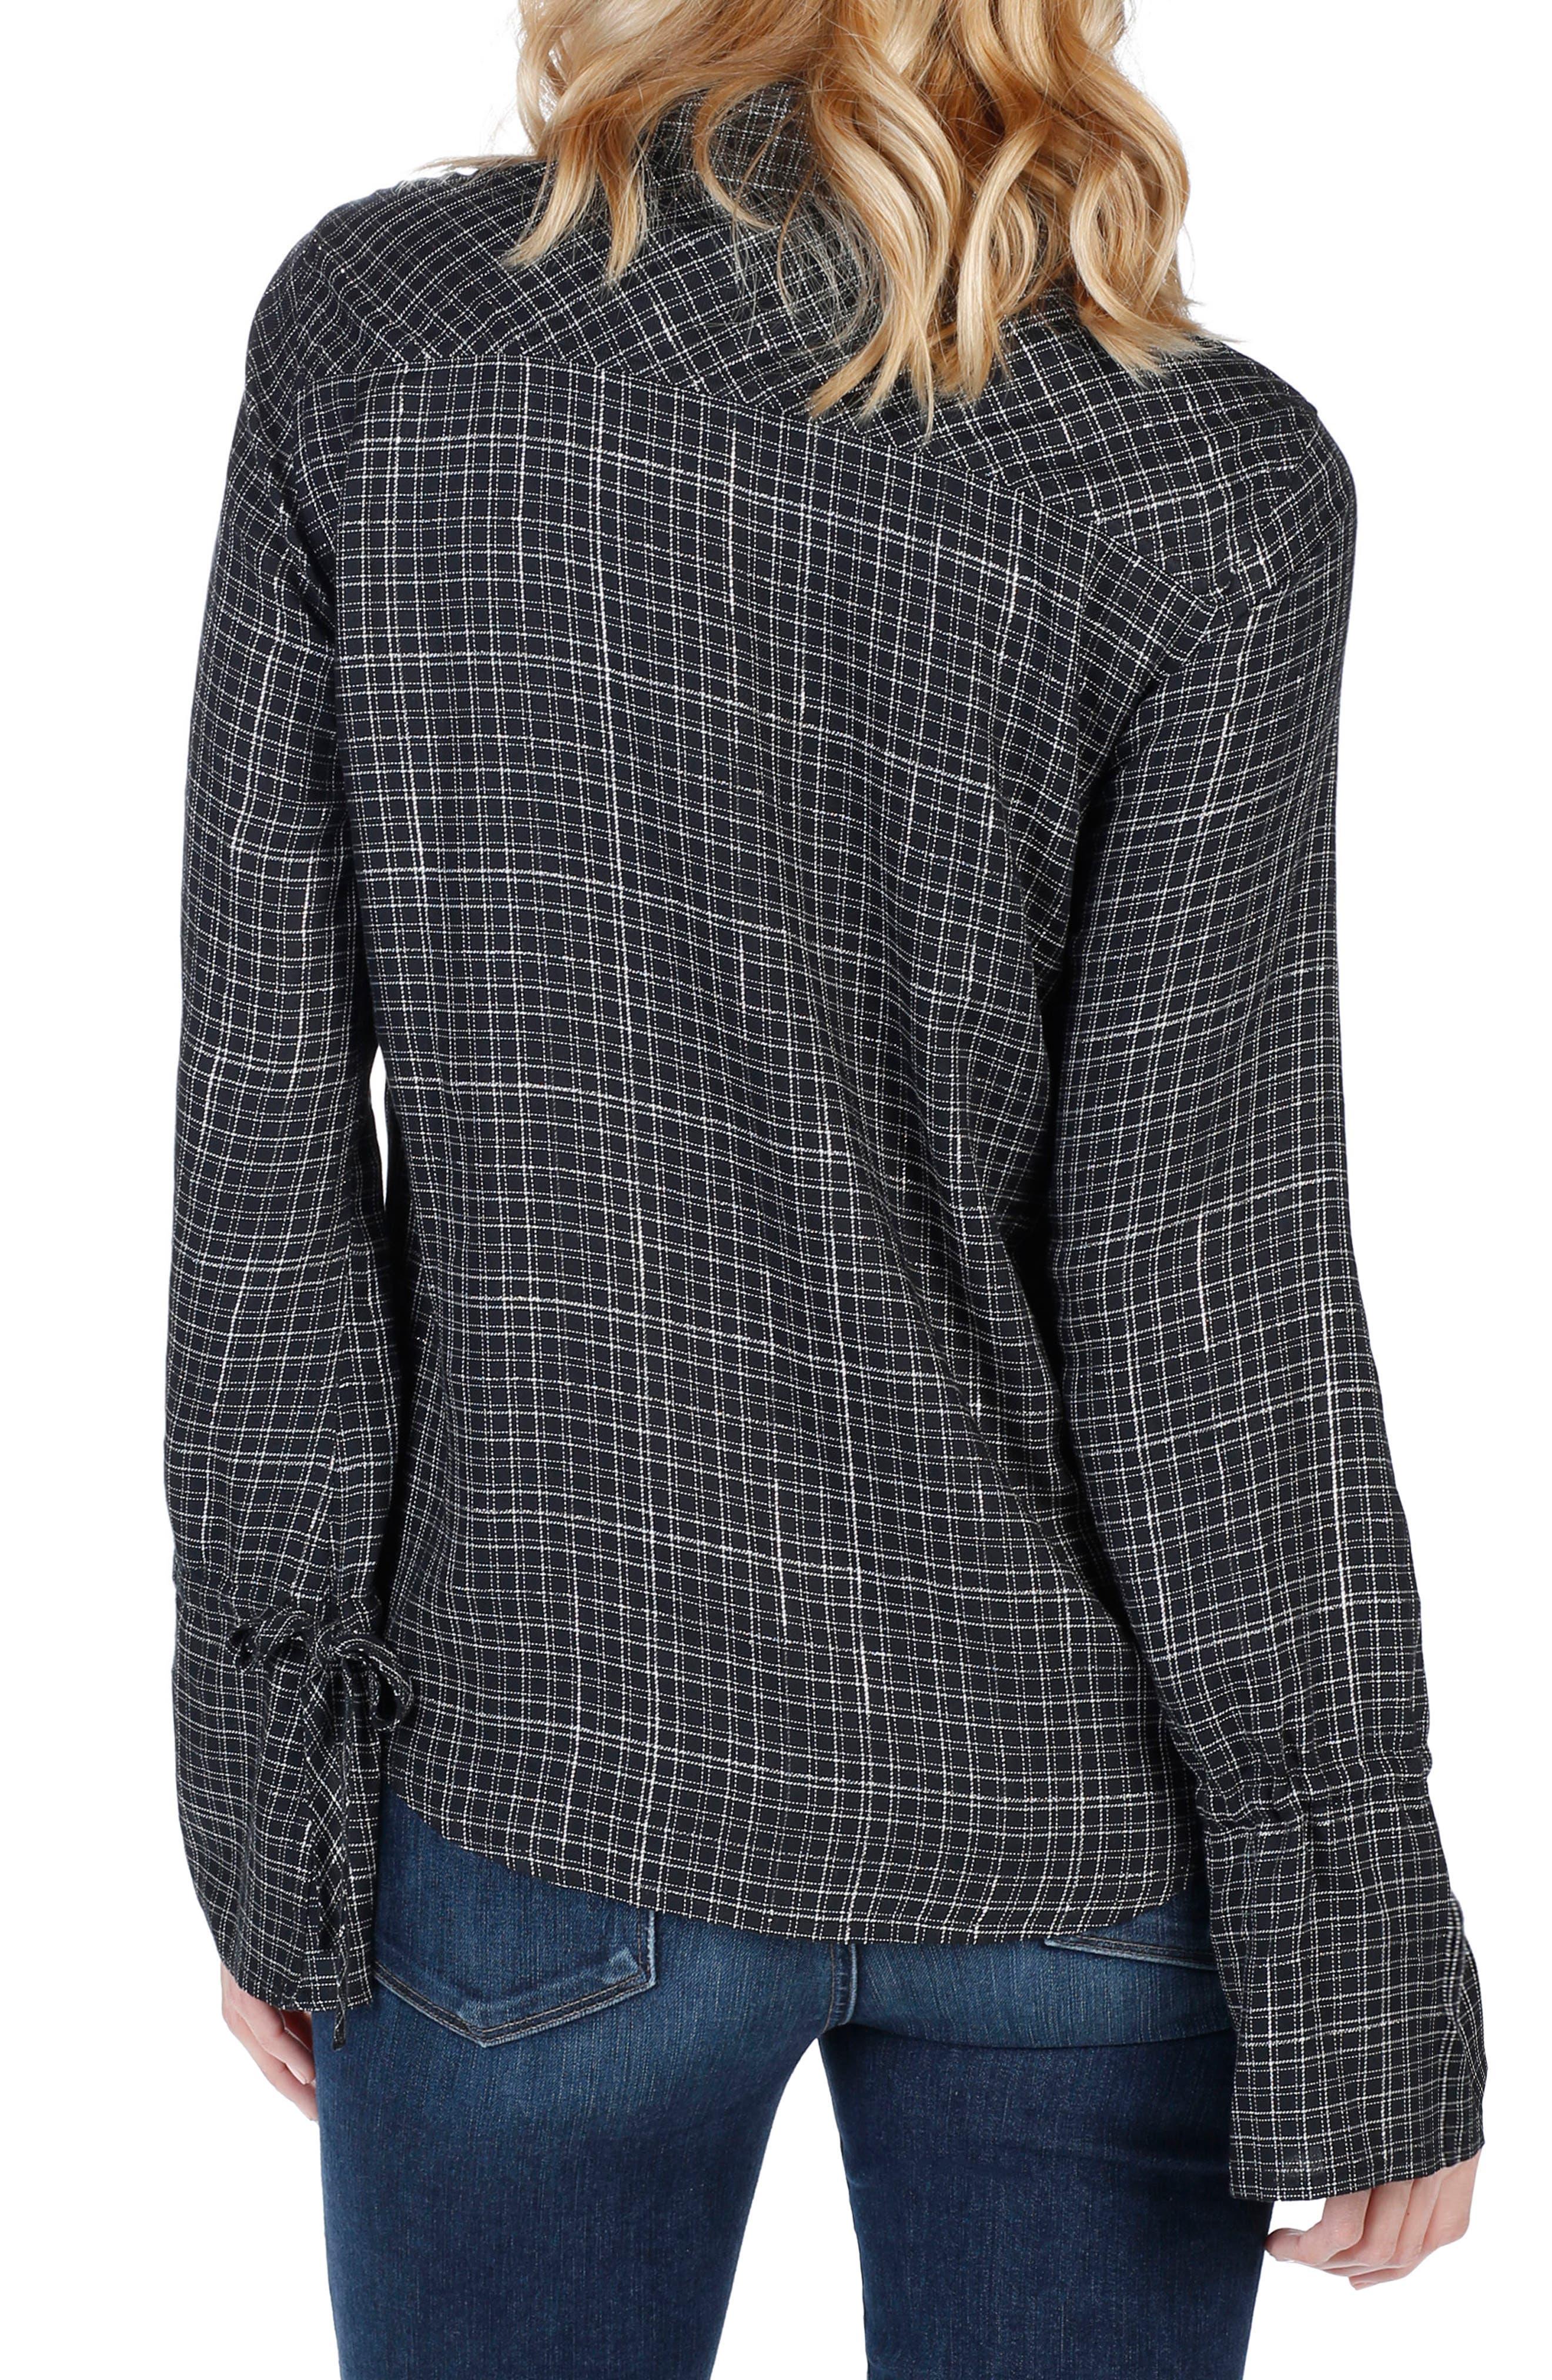 Calissa Shirt,                             Alternate thumbnail 2, color,                             Black Gunmetal Lurex